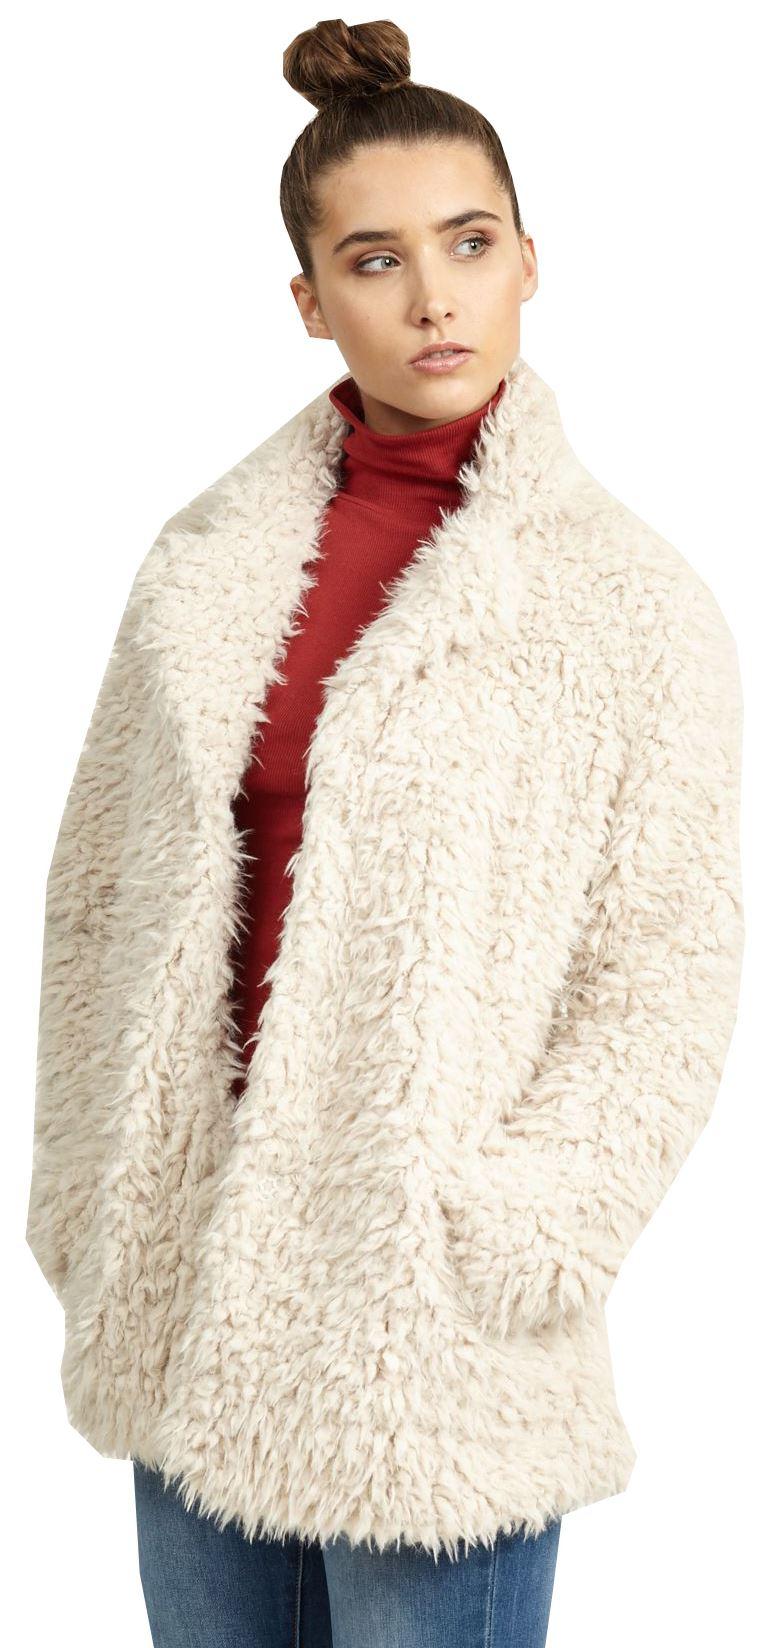 Womens Gabriel Designer Super Soft Fluffy Satin Line Faux Fur Jacket Coat 8-24